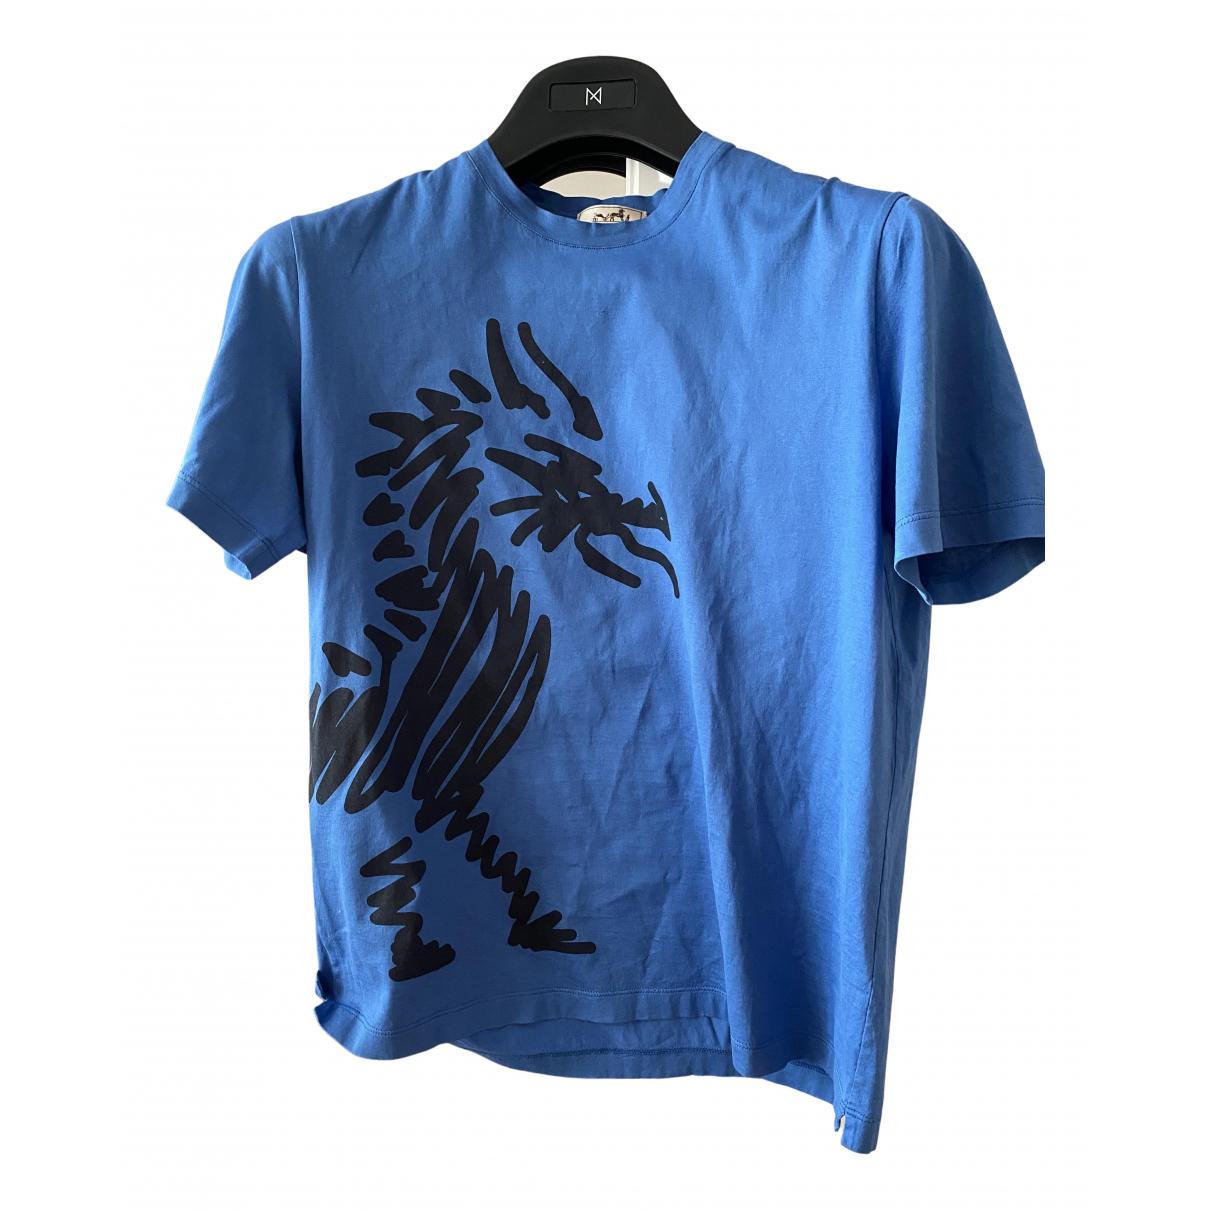 Camiseta Hermes